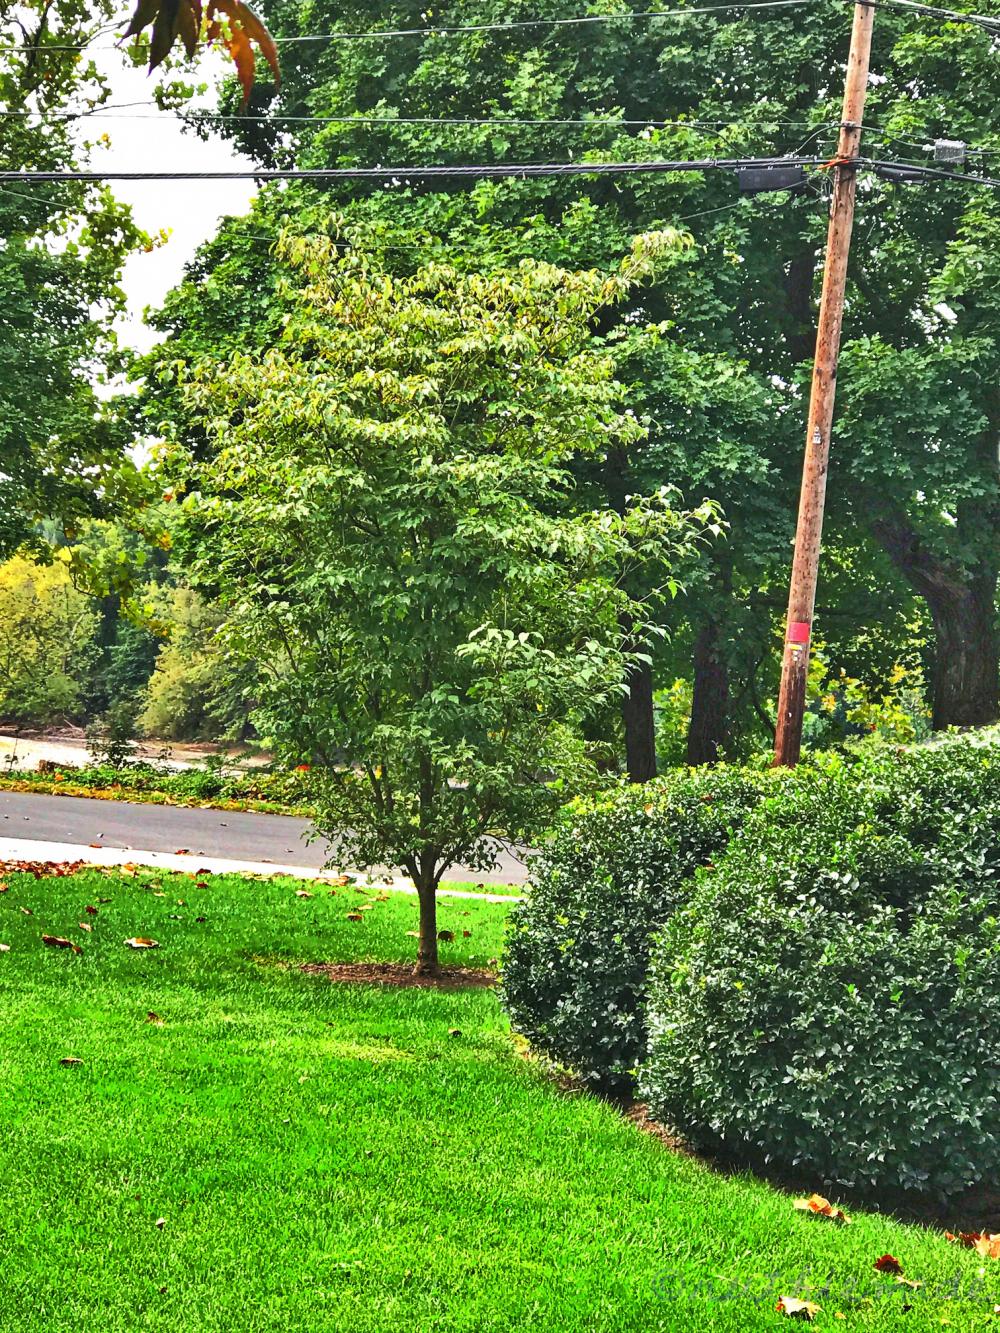 October Dogwood Tree